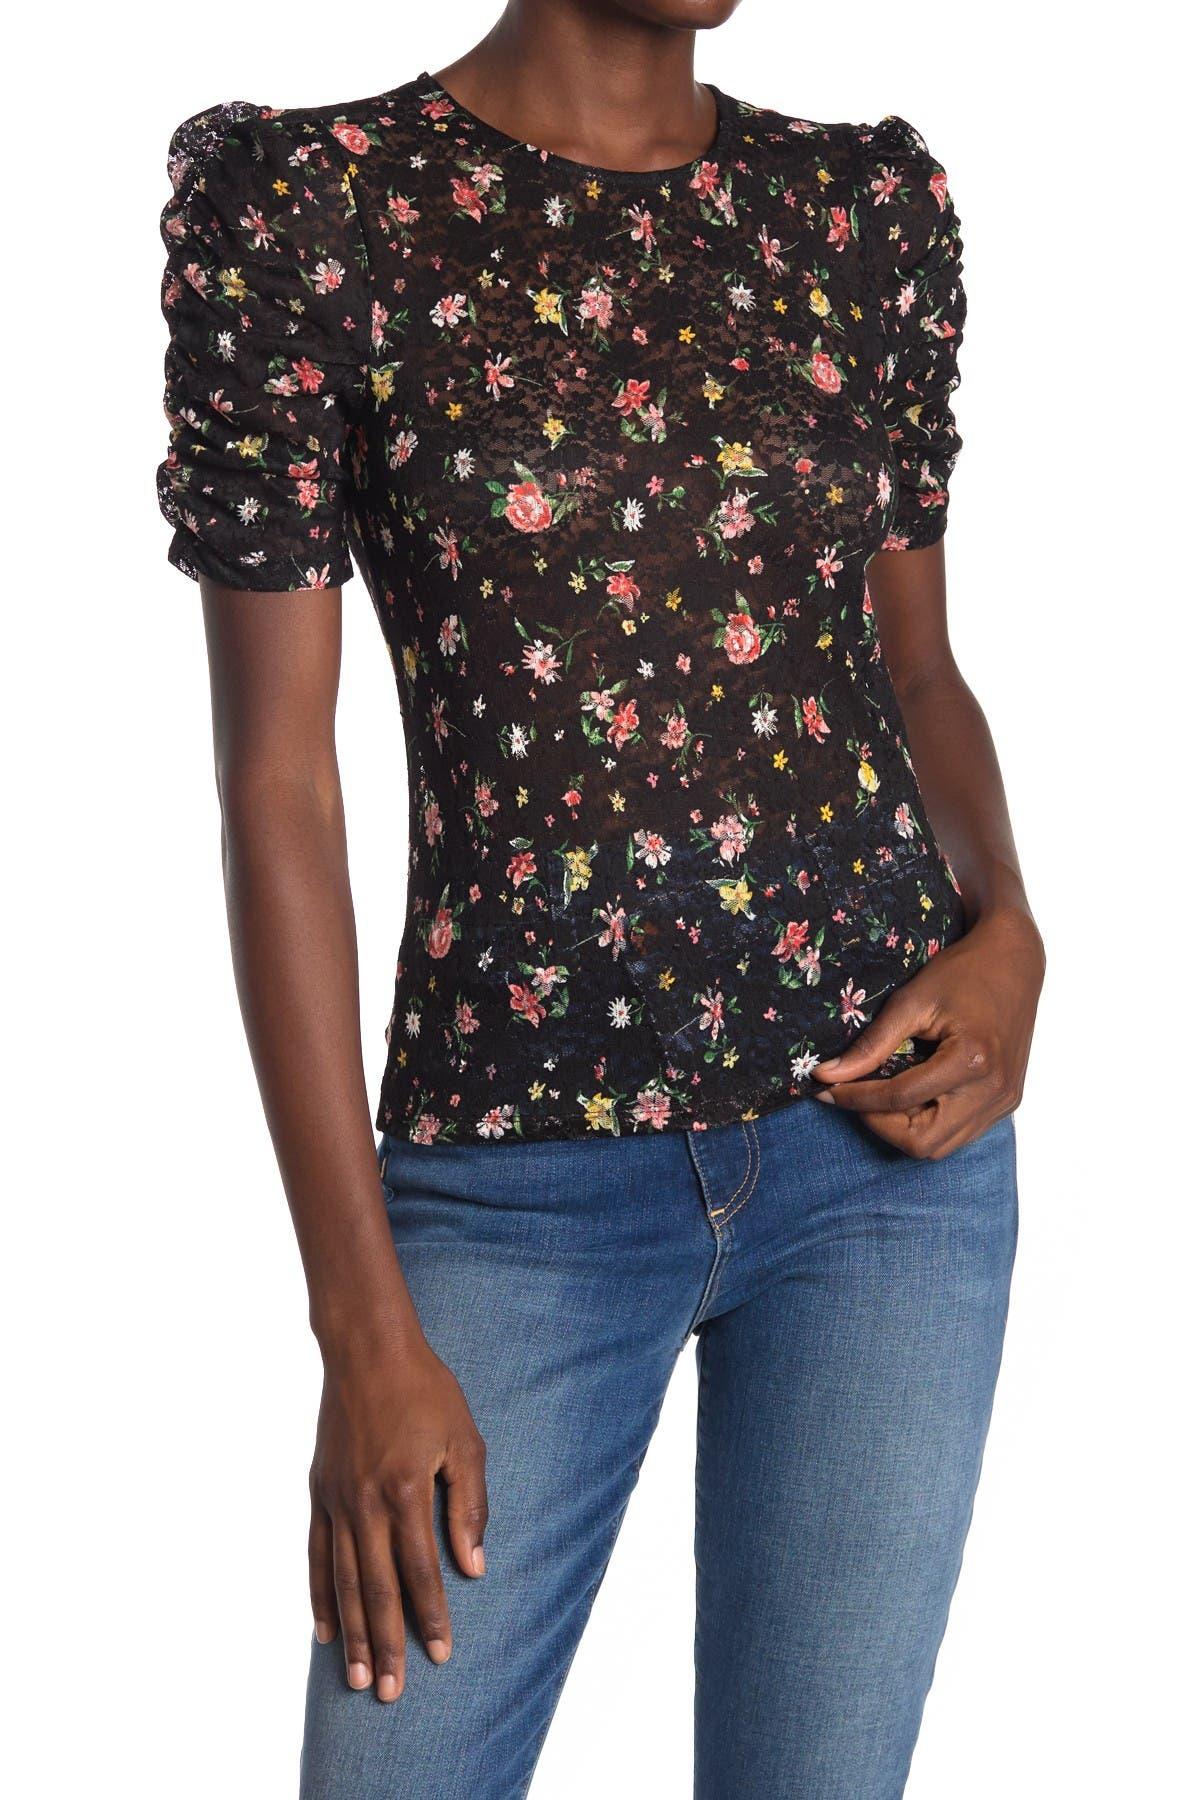 Image of Elodie Printed Lace Short Sleeve Top